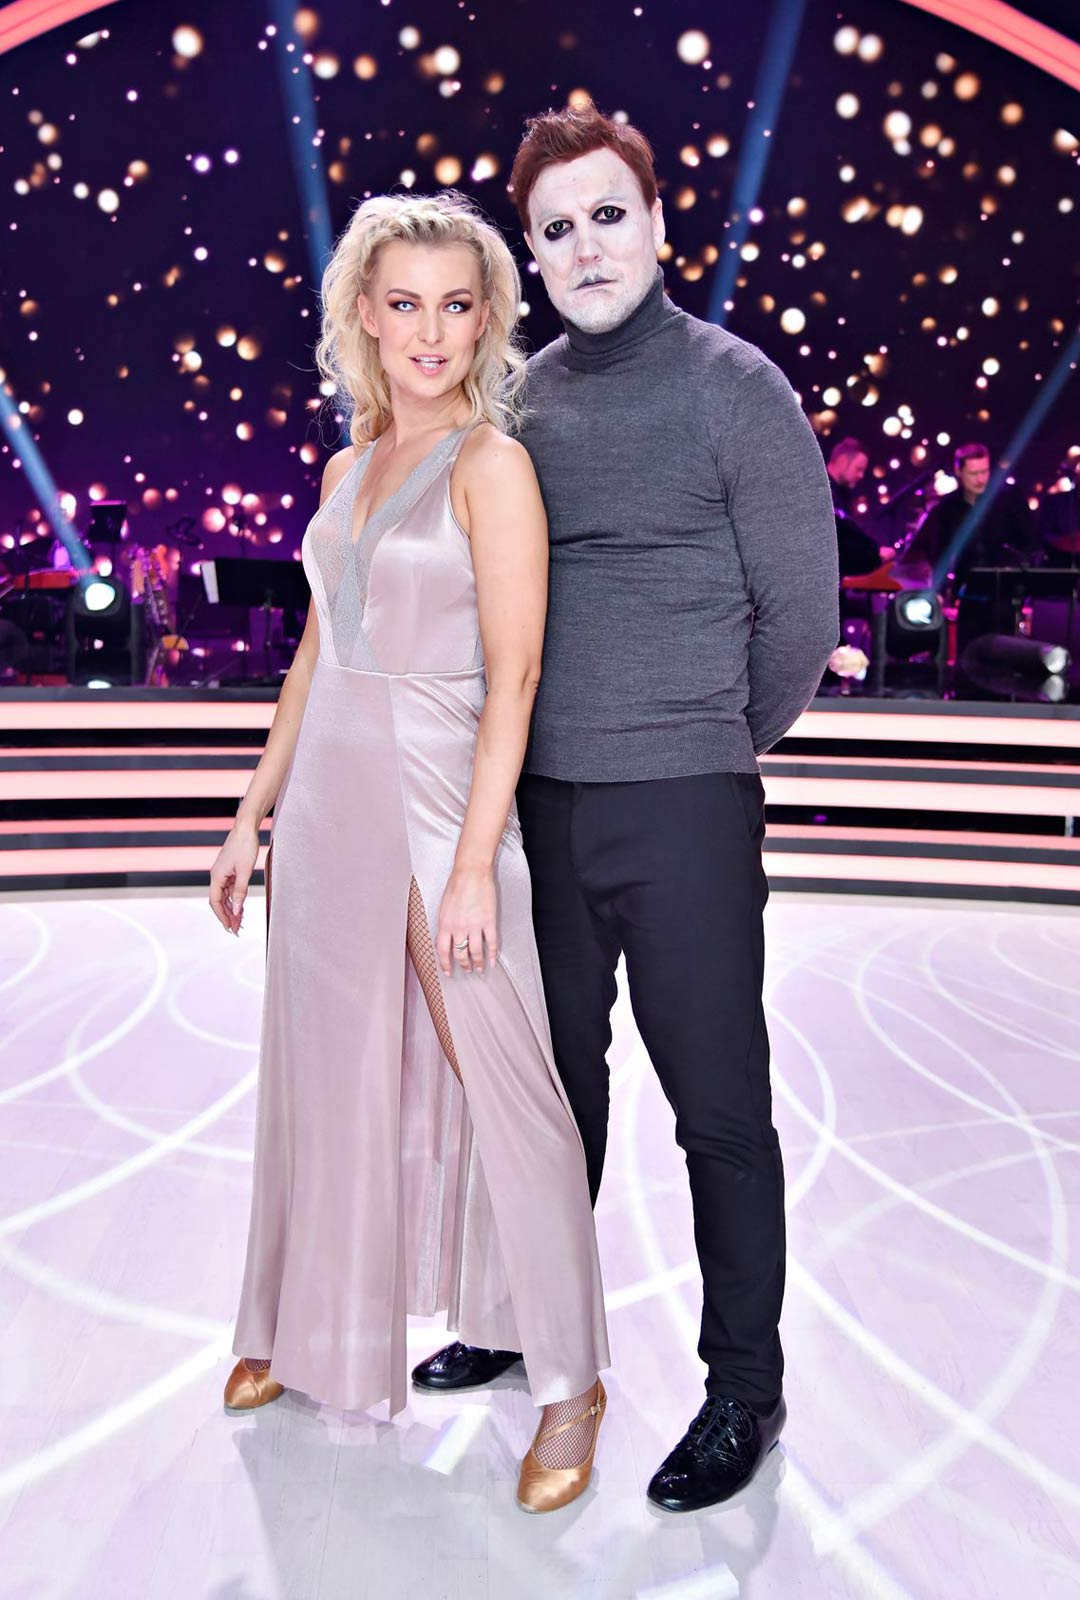 Ex-kiekkotähti Niklas Hagman ja tanssinopettaja Kia Lehmuskoski.